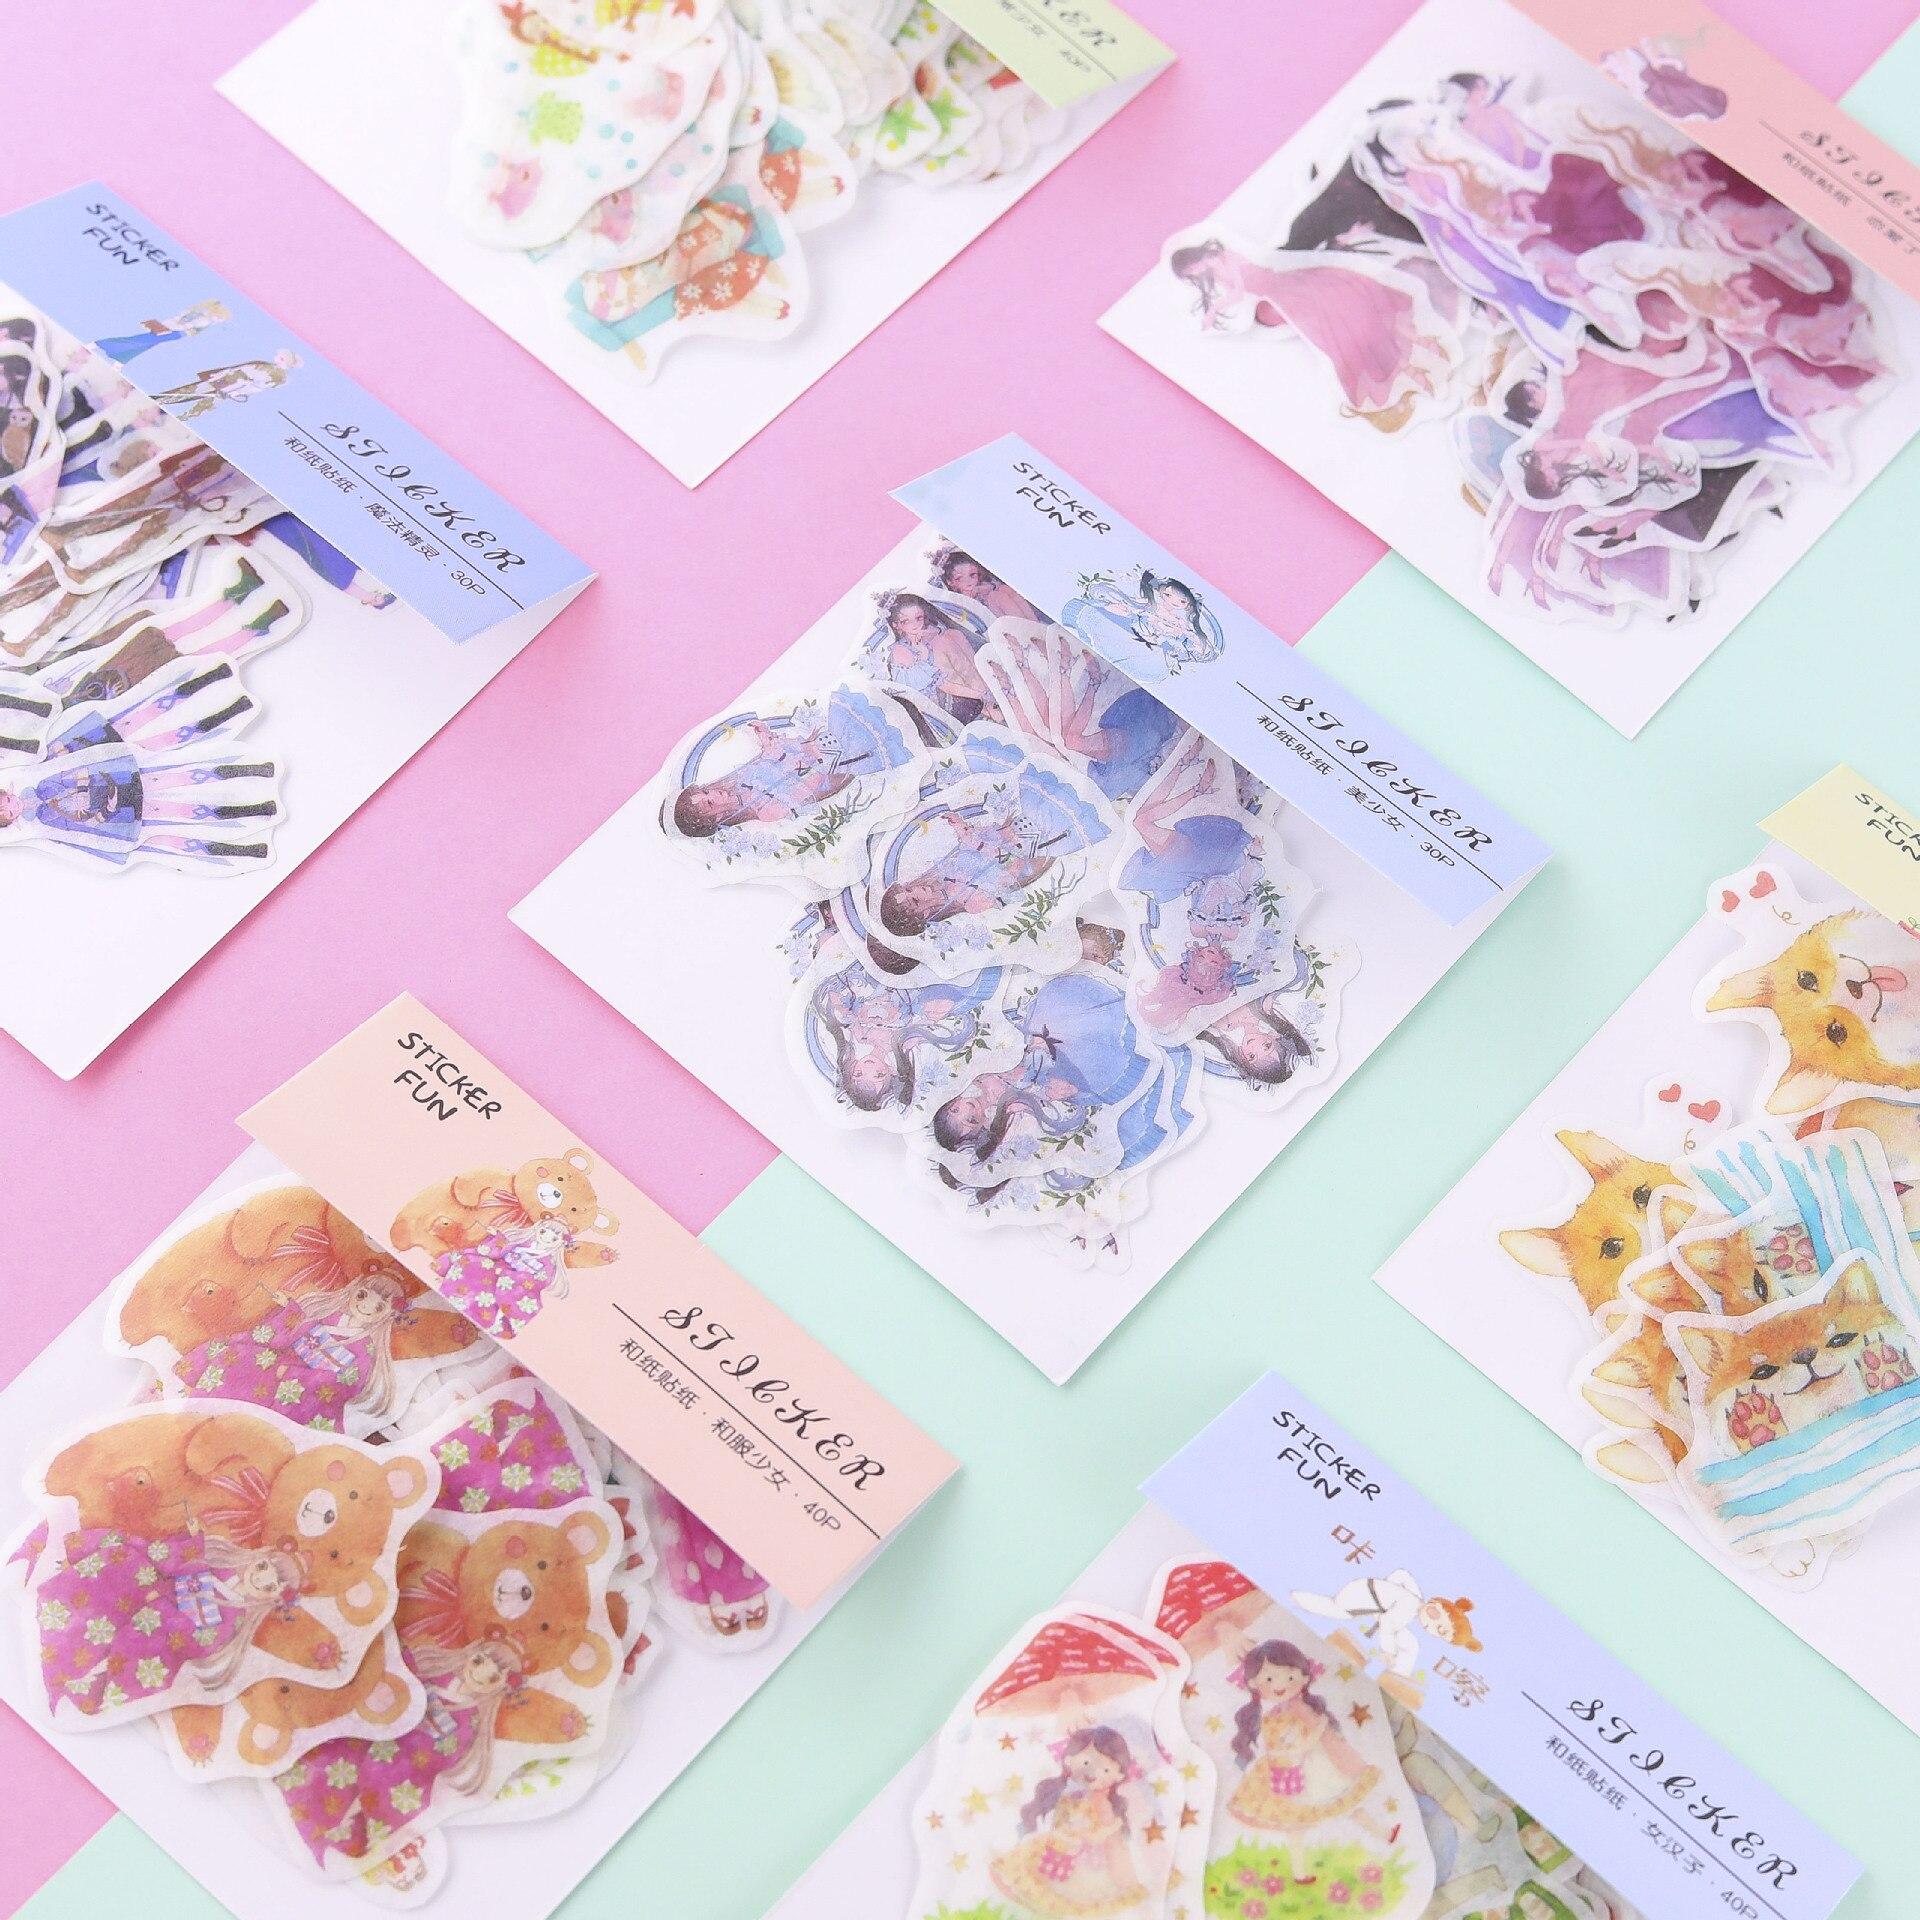 30pcs/pack Cute Fairy Sticker Decoration DIY Album Diary Scrapbooking Label Sticker Kawaii Stationery